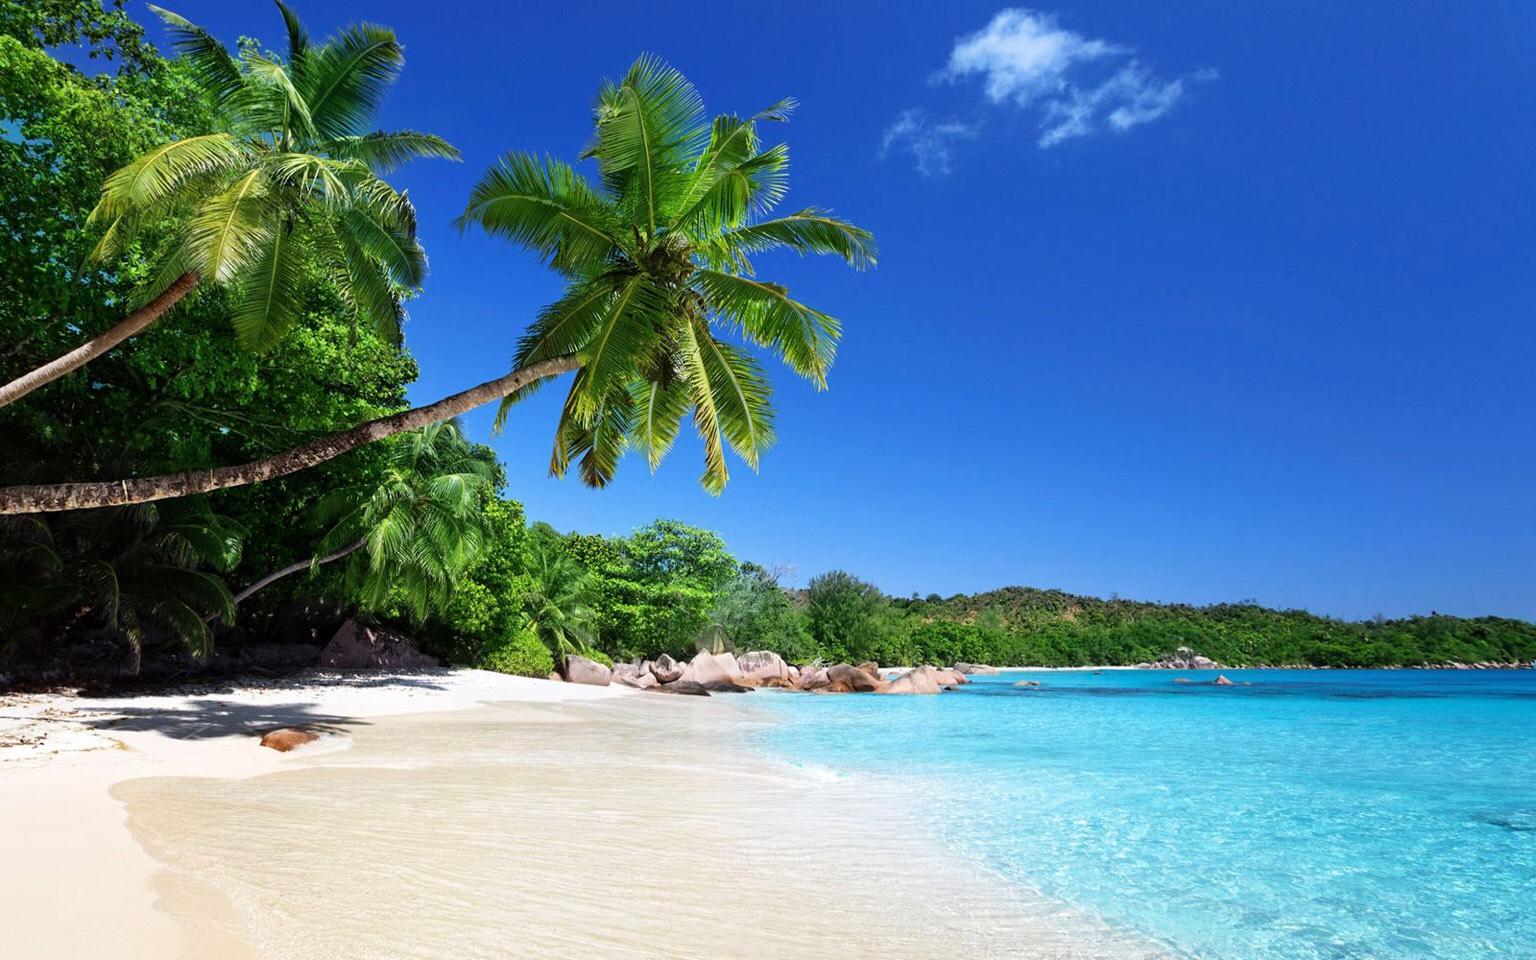 10. Anse lazio, praslin, Seychelles